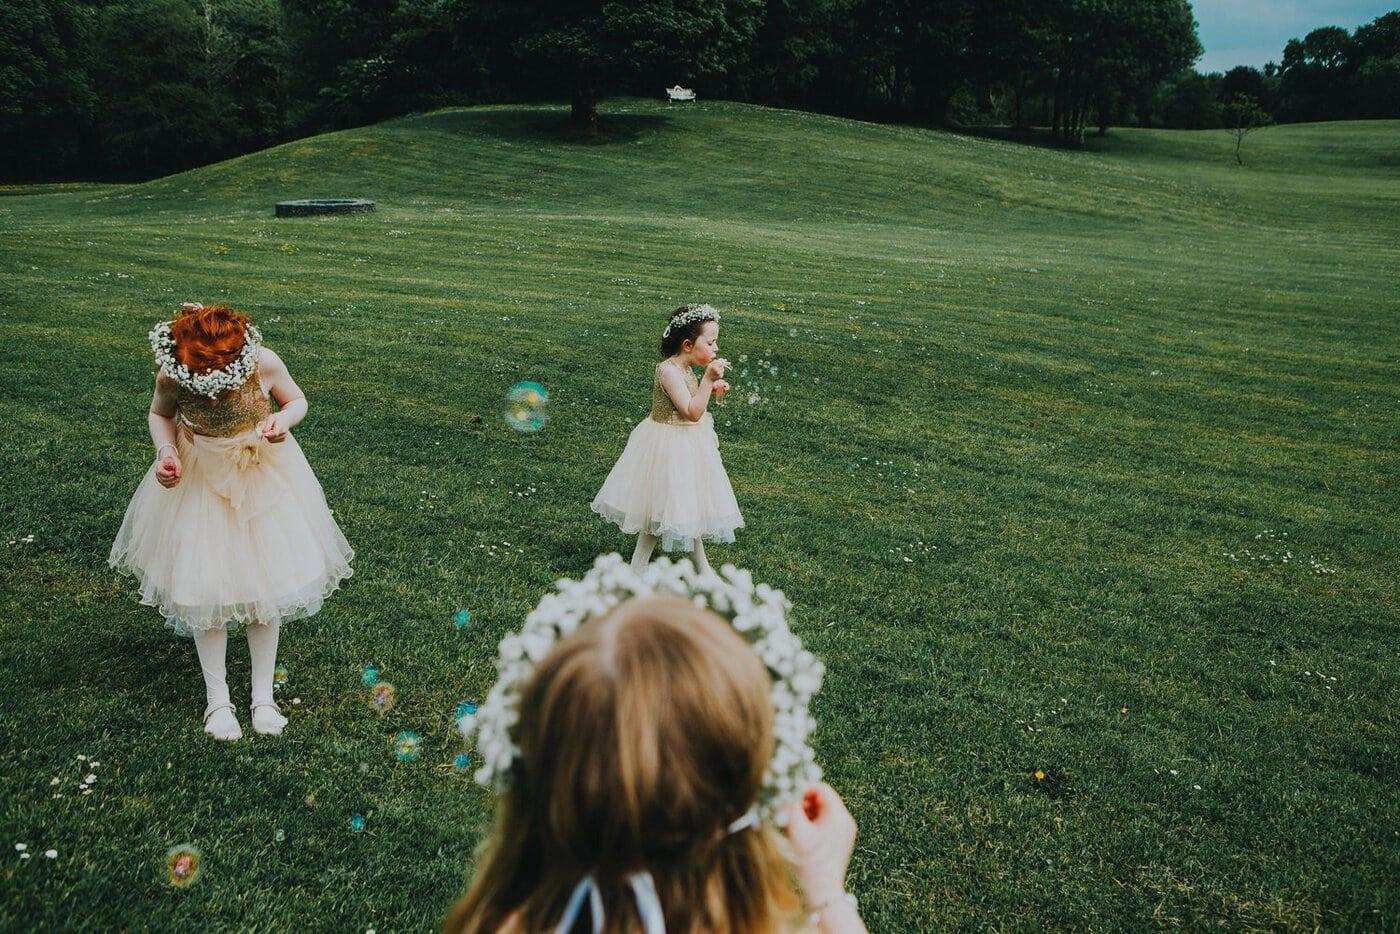 derry-wedding-photographers-northern-ireland (11)